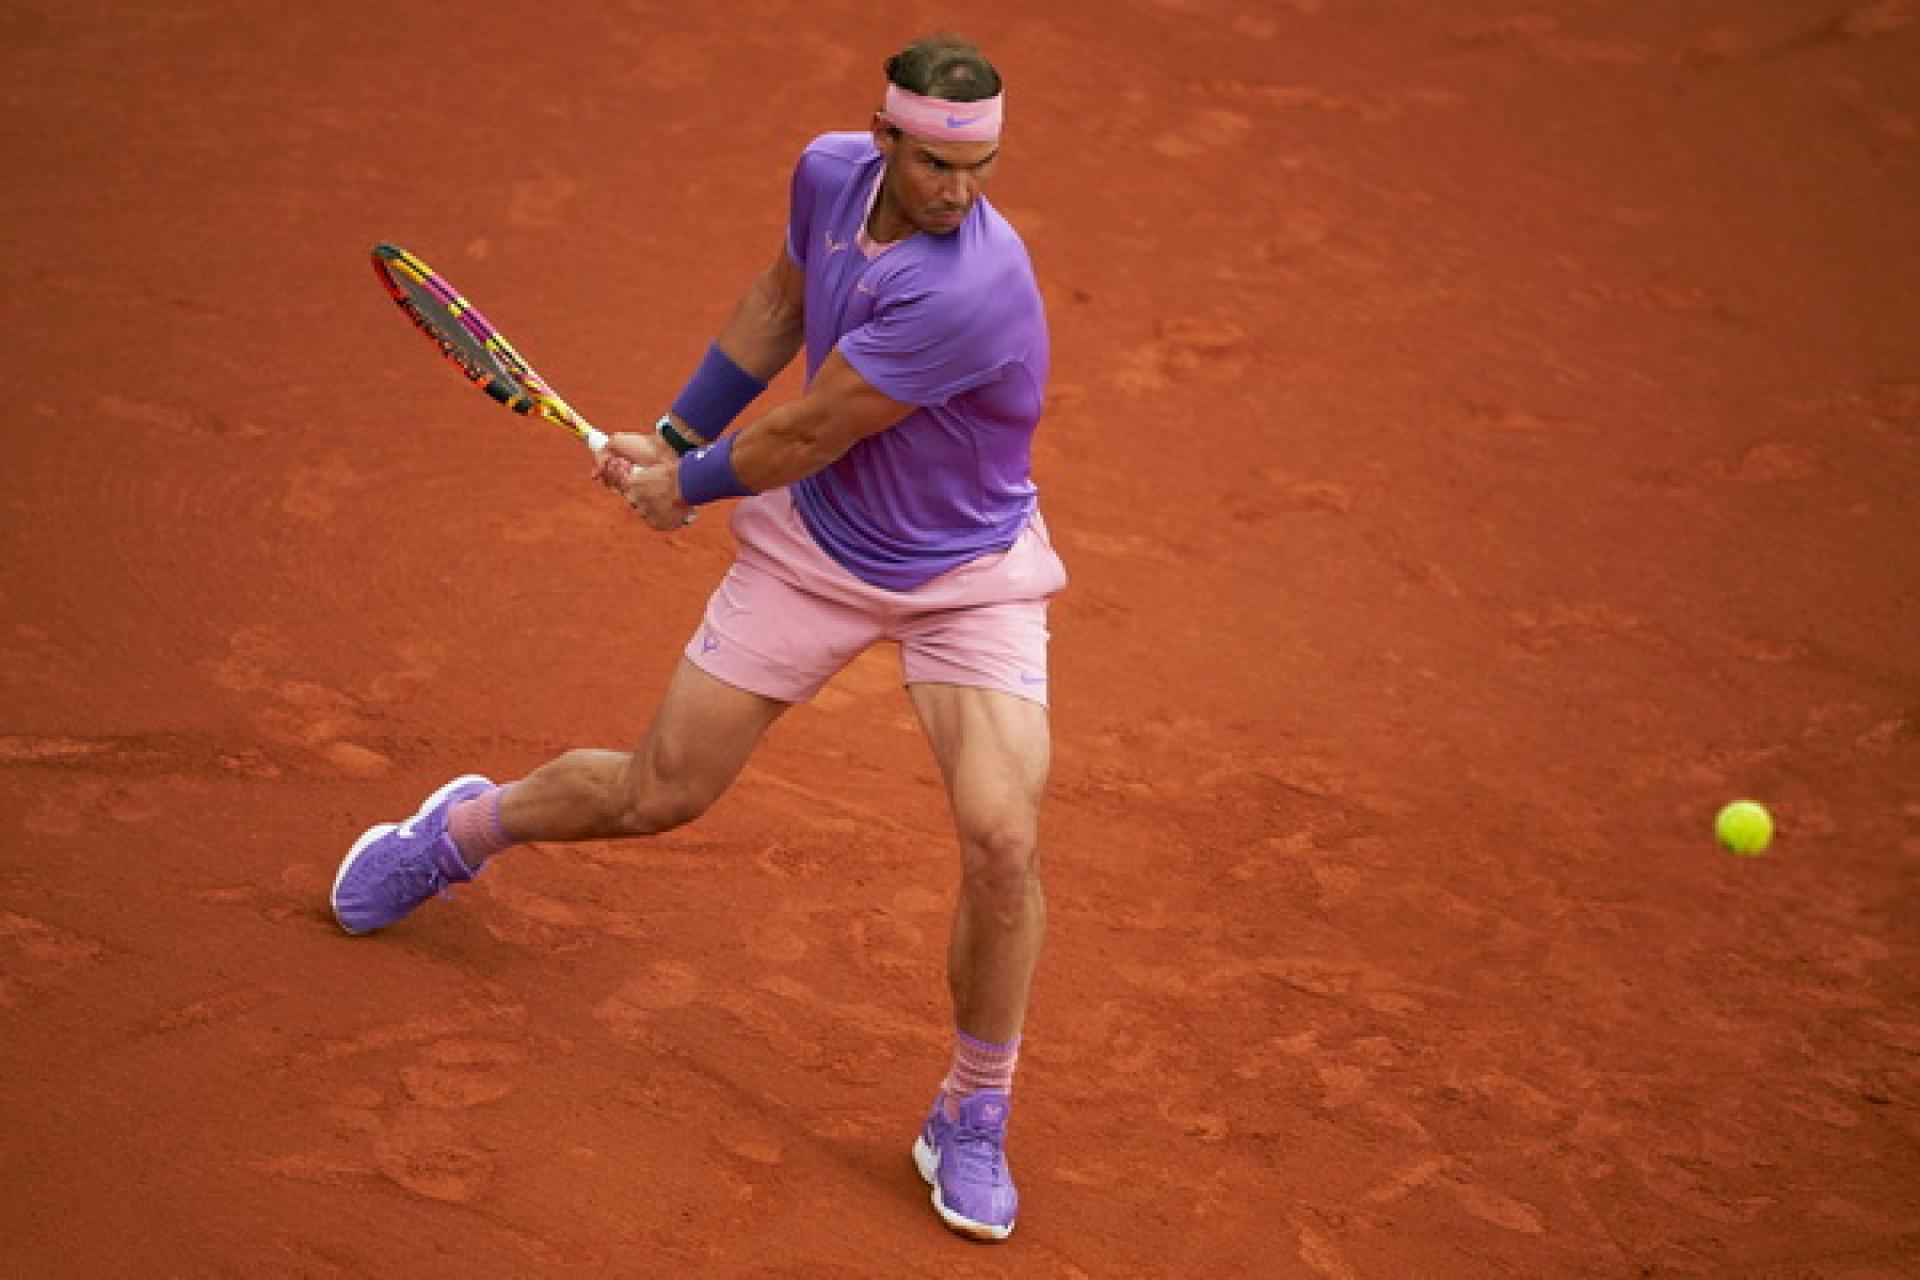 Barcelona Open 2021: Rafael Nadal vs. Kei Nishikori Tennis Pick and Prediction